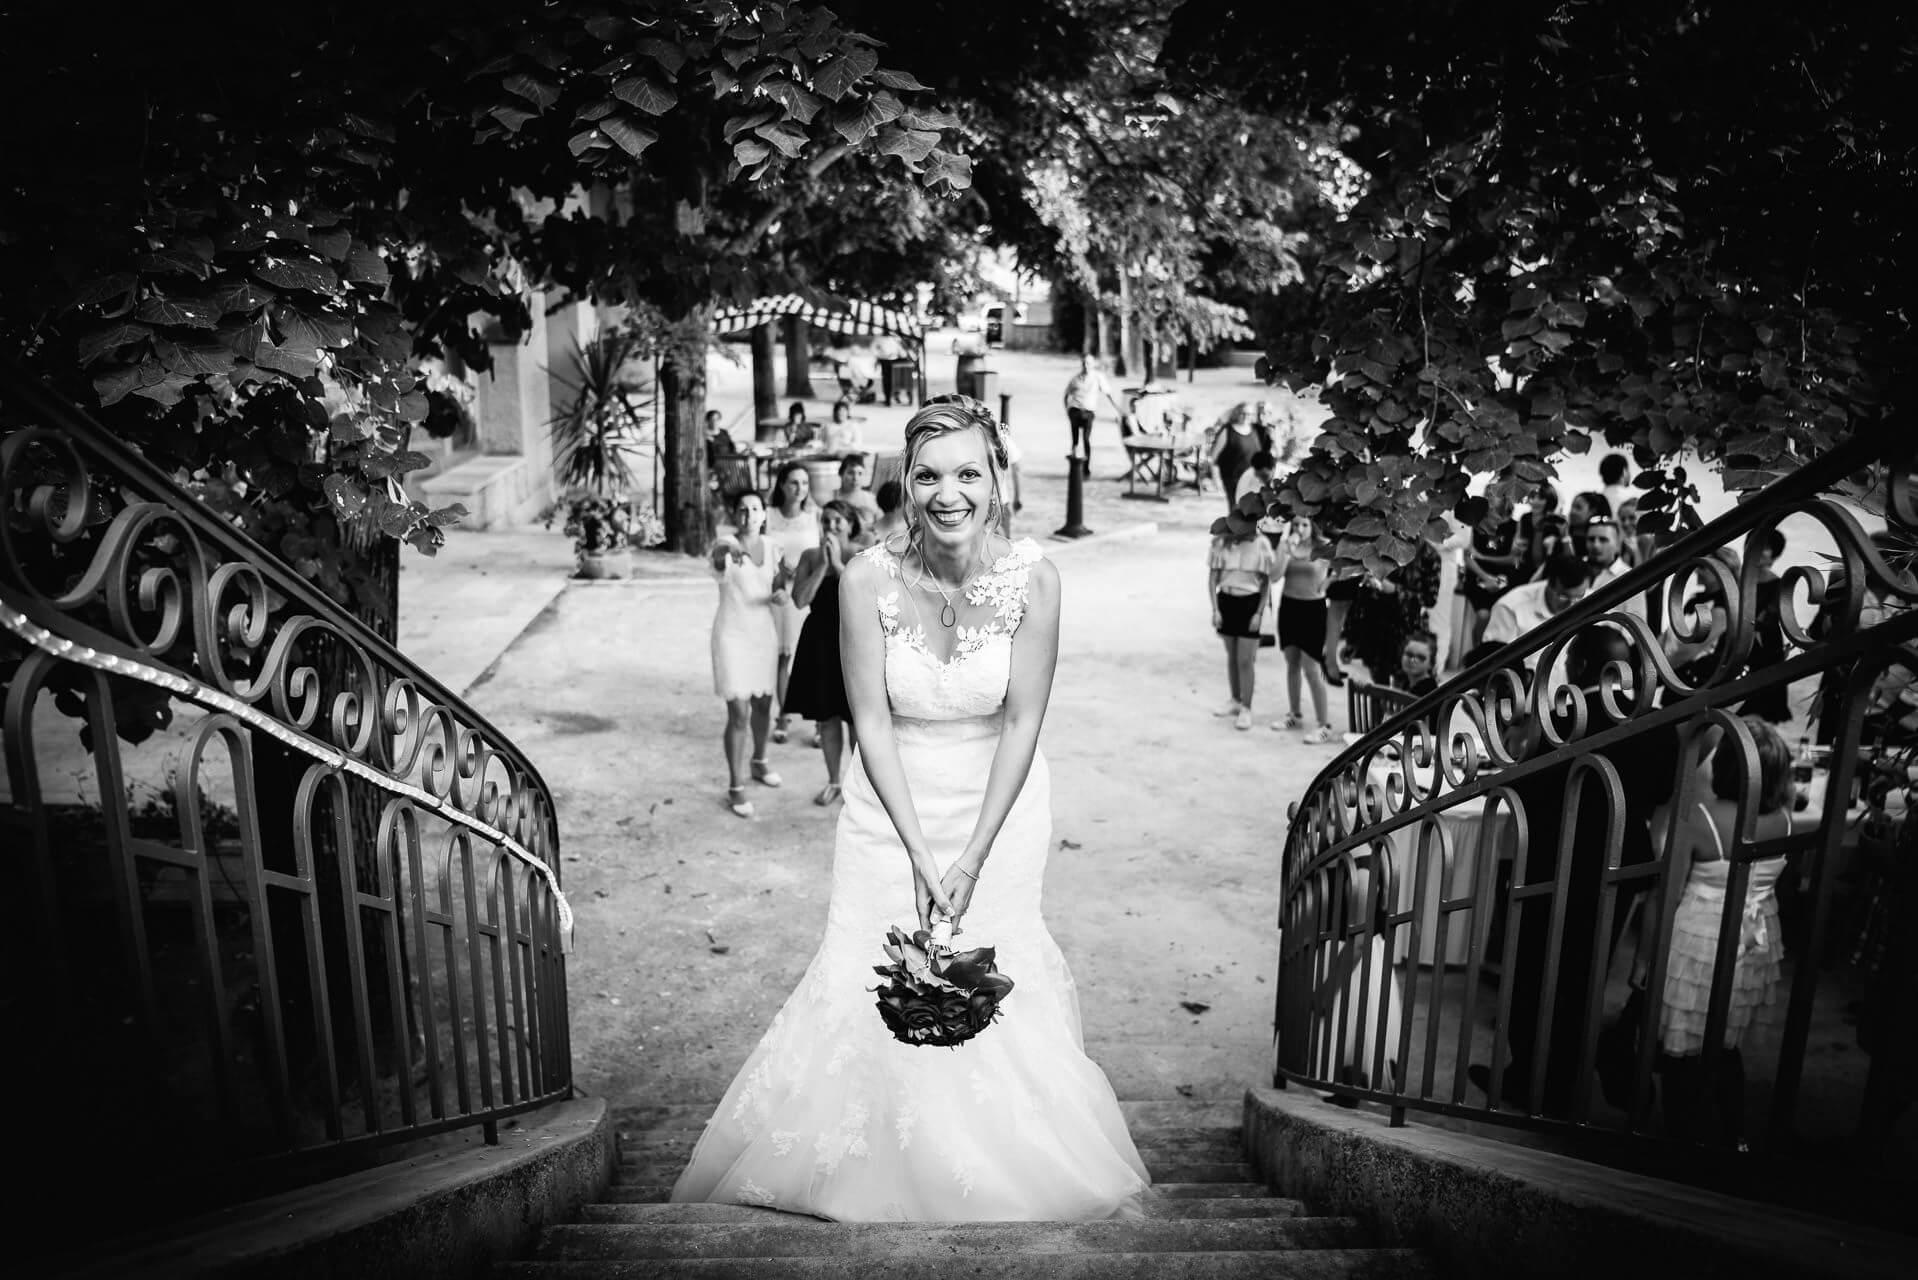 photographe mariage montblanc beziers domaine argentiere